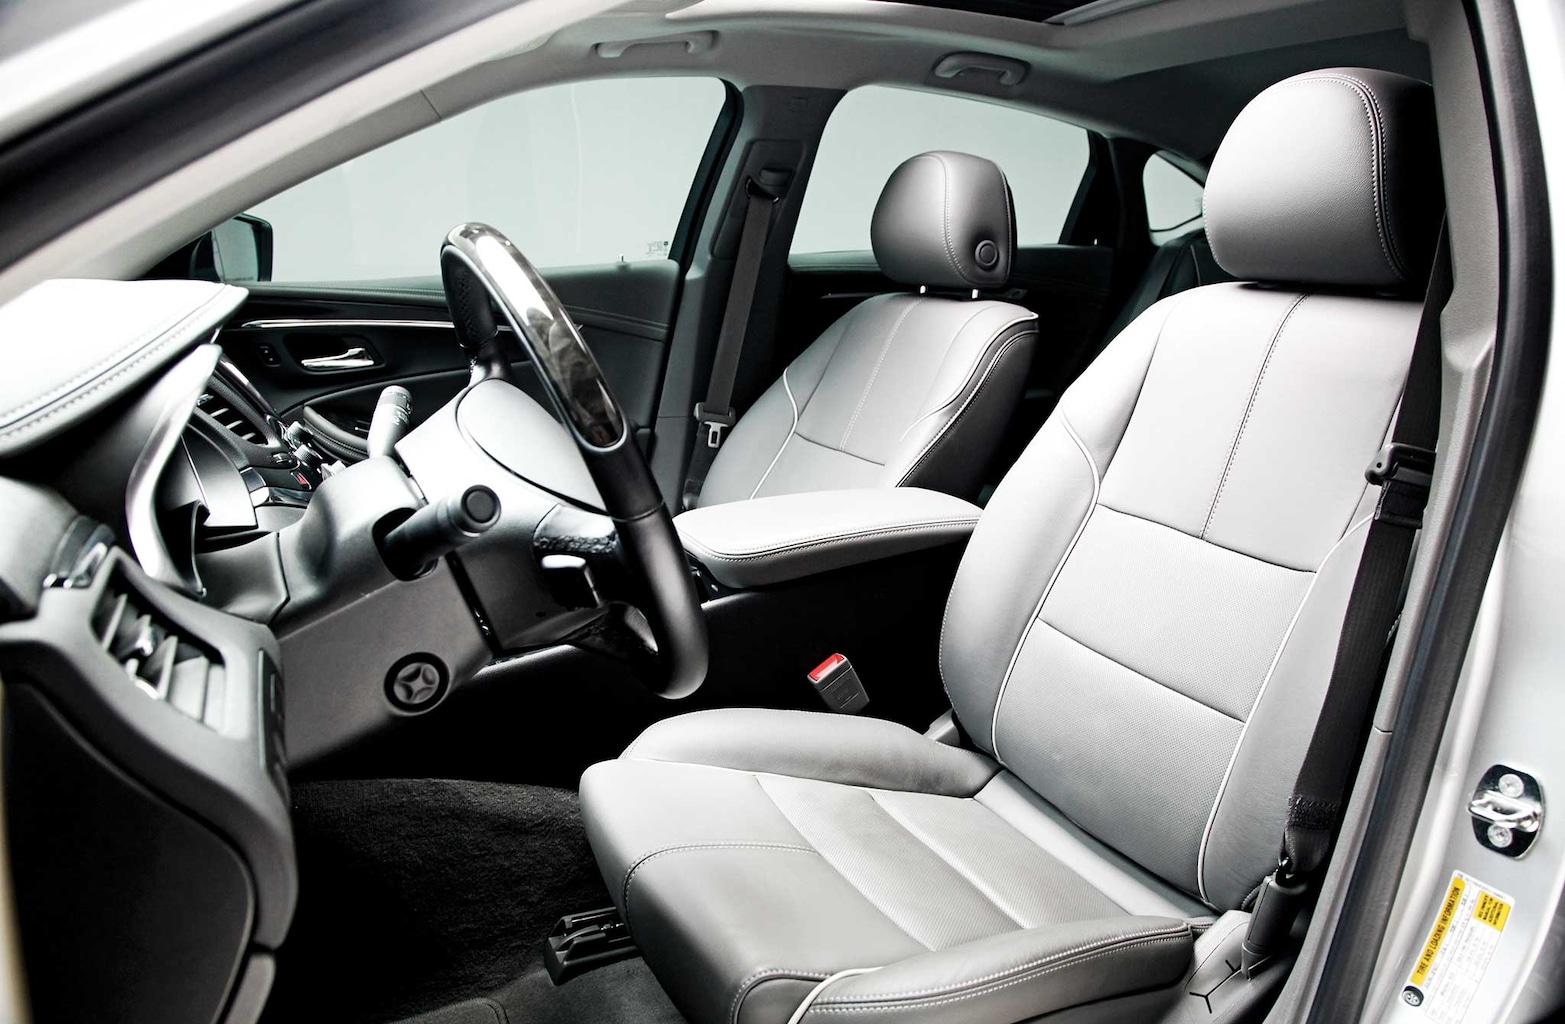 030 2014 chevrolet impala front seats